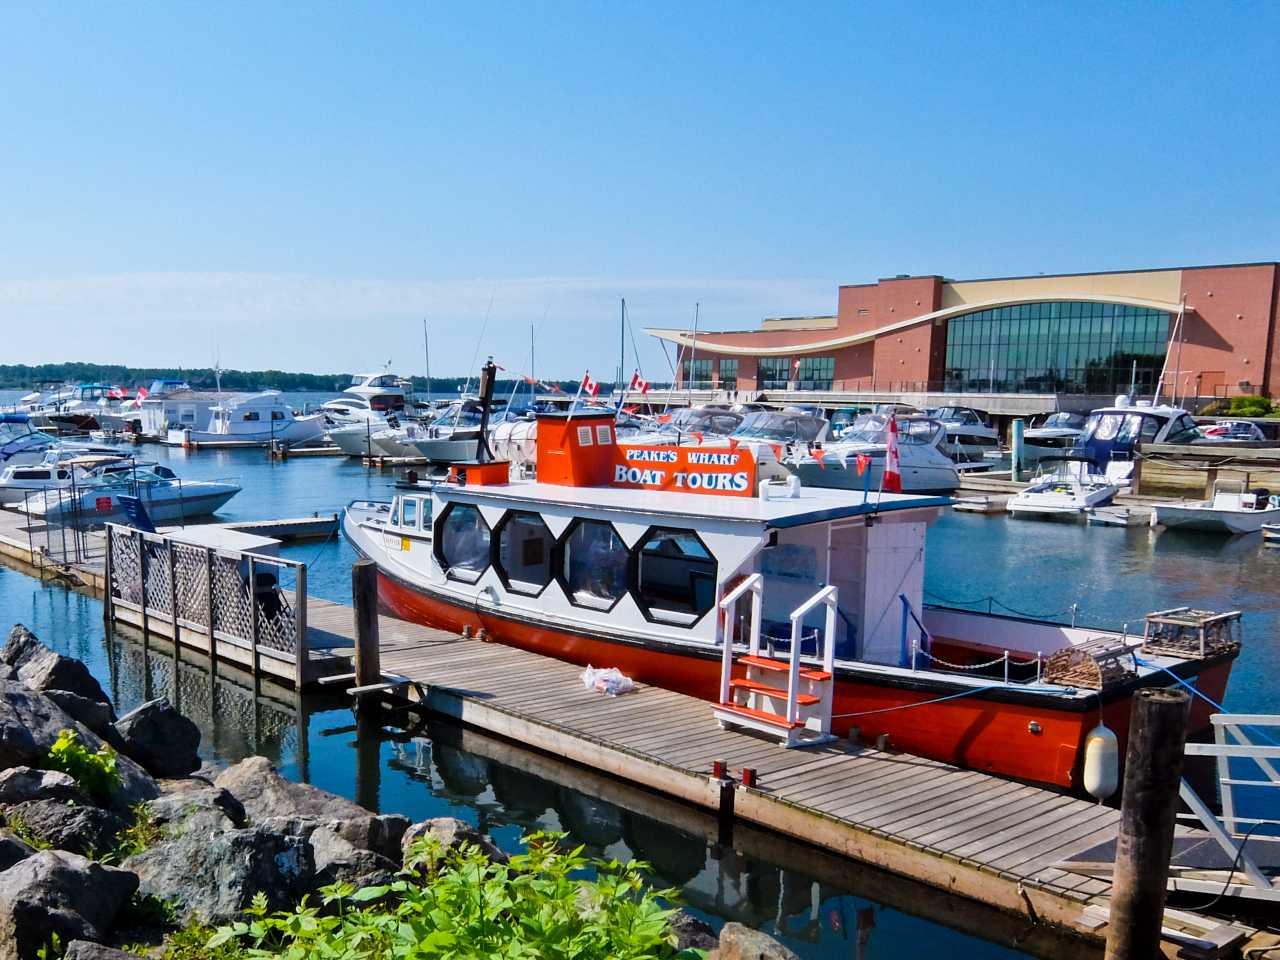 Peaks Wharf, Charlottetown, Prince Edward Island